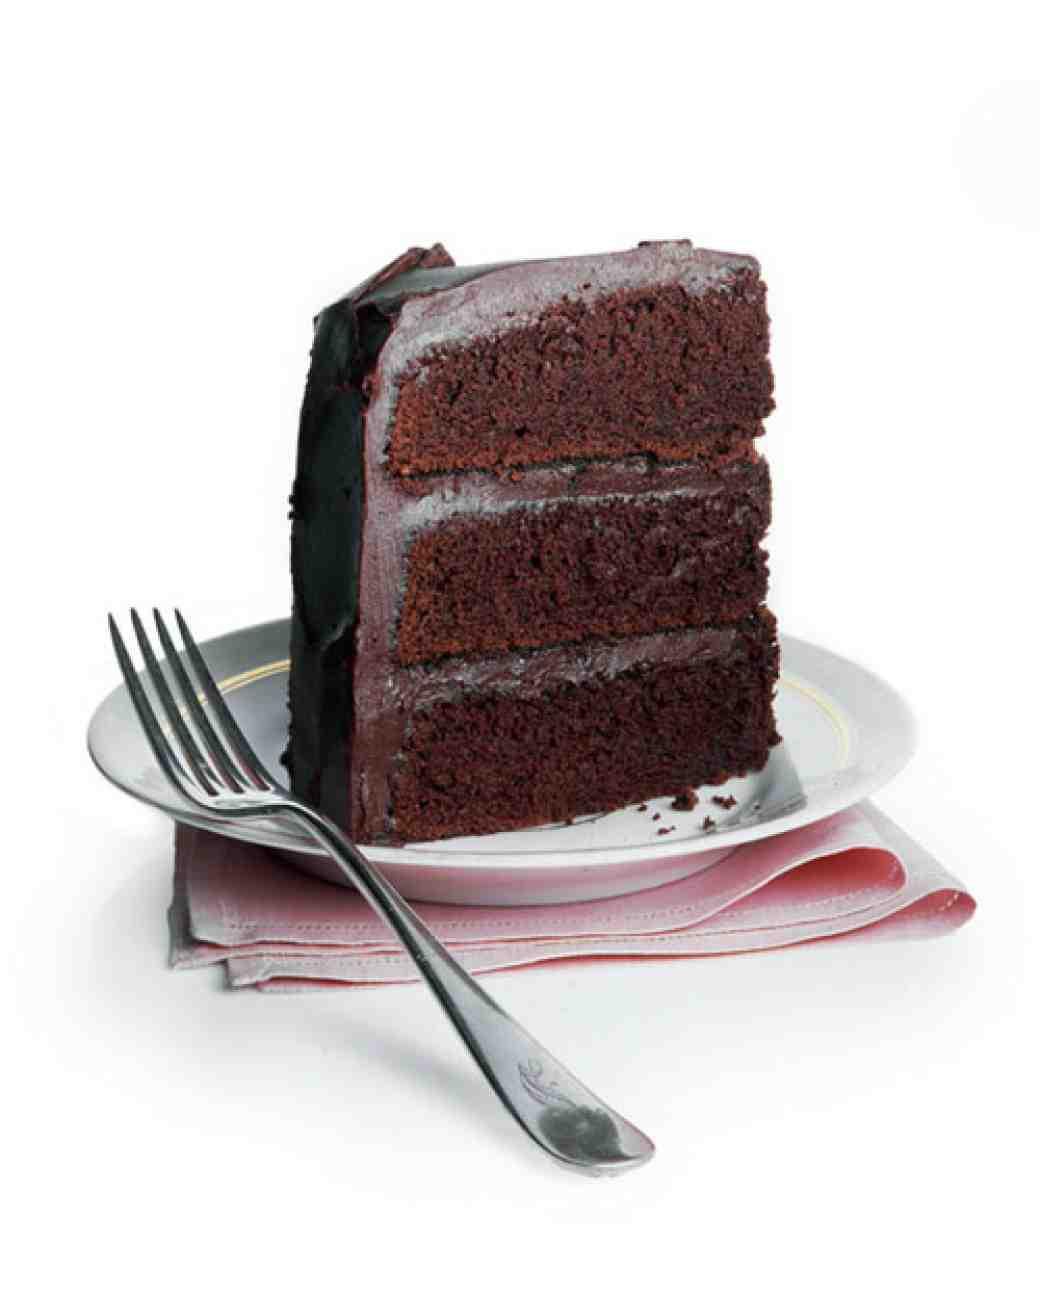 Martha Stewart Chocolate Cake  Mrs Milman s Chocolate Frosting Recipe & Video